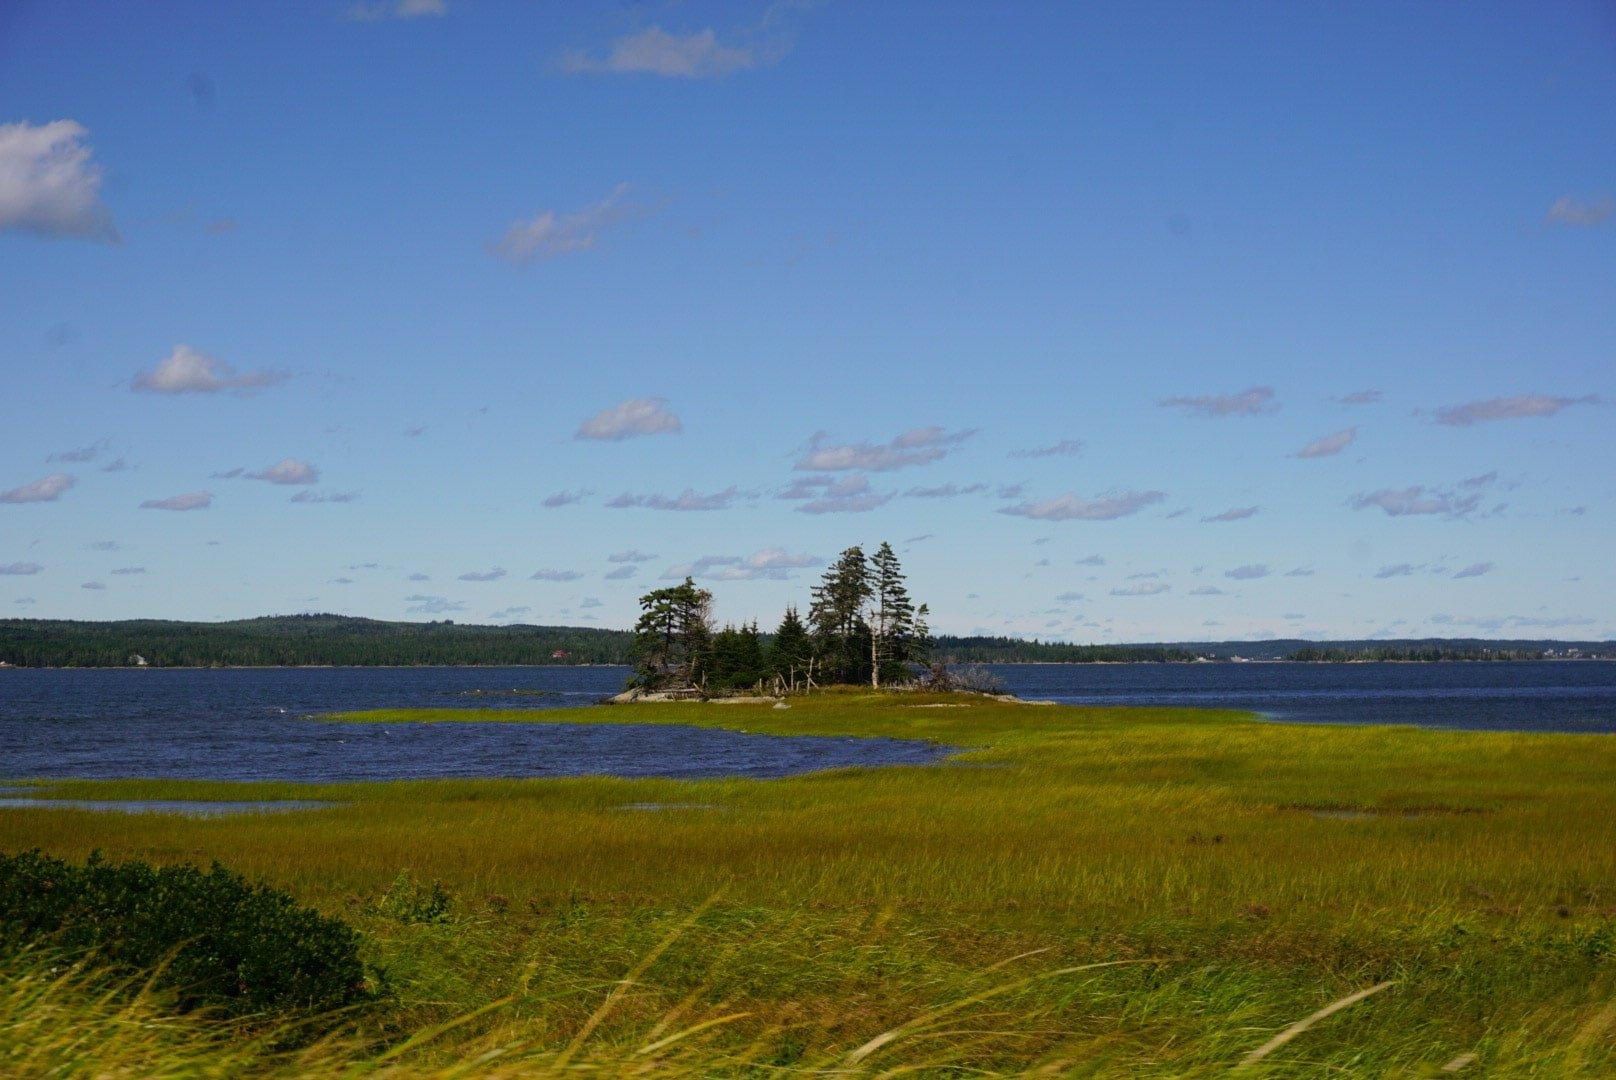 5 Epic Destinations on Nova Scotia' South Shore #novascotia BUCKETLIST BRI www.bucketlistbri.com #canada #adventure #travel